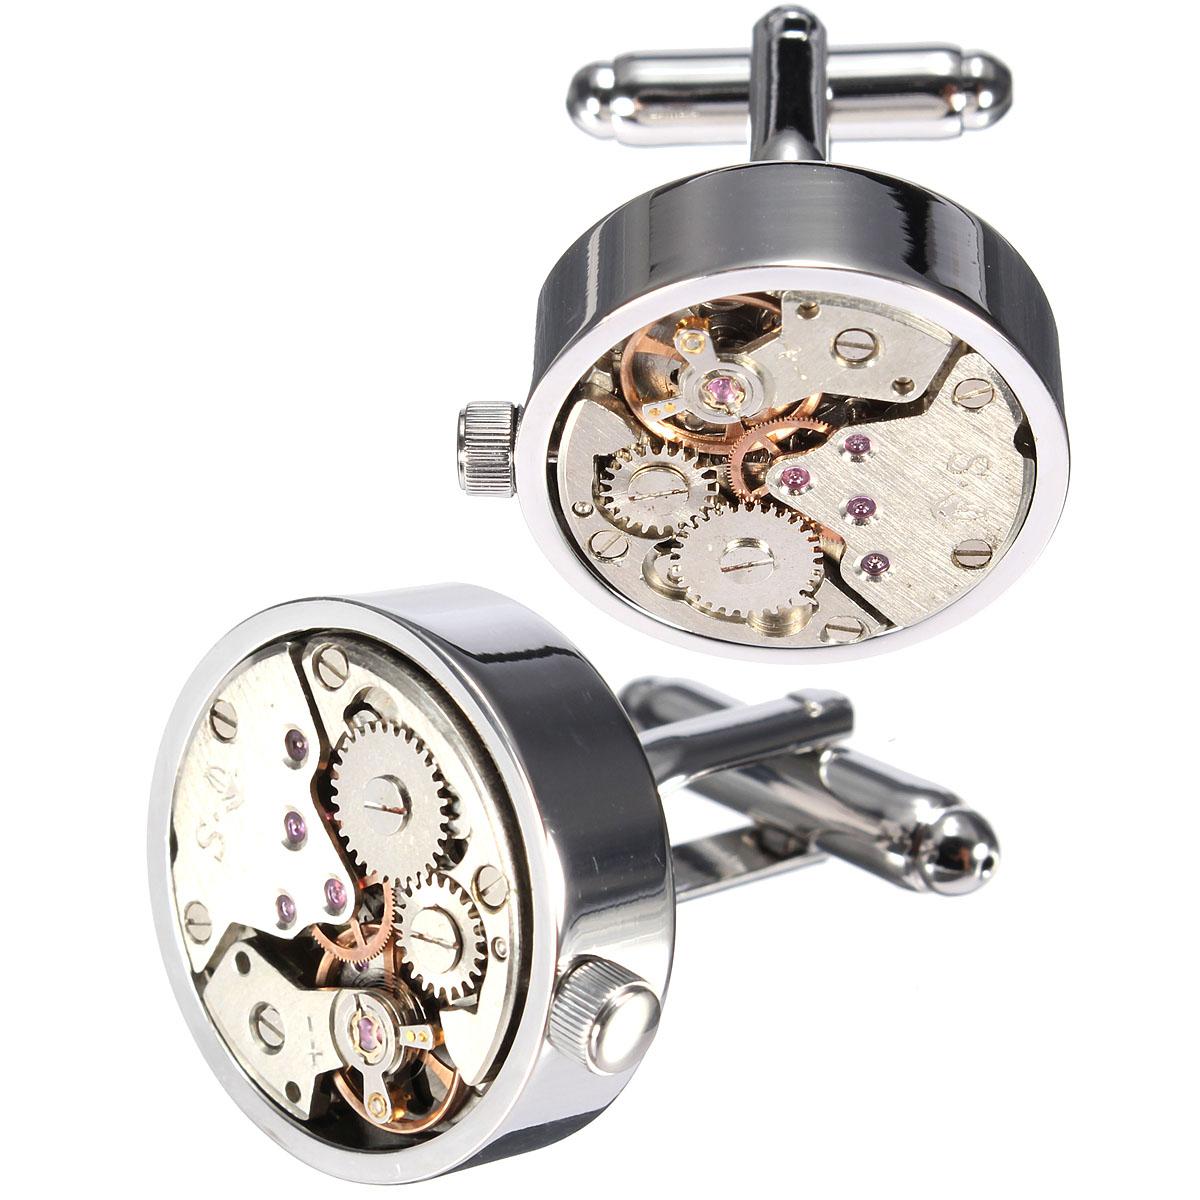 Men Male Silver Mechanical Watch Pattern Cuff Links Wedding Gift Suit Shirt Accessories